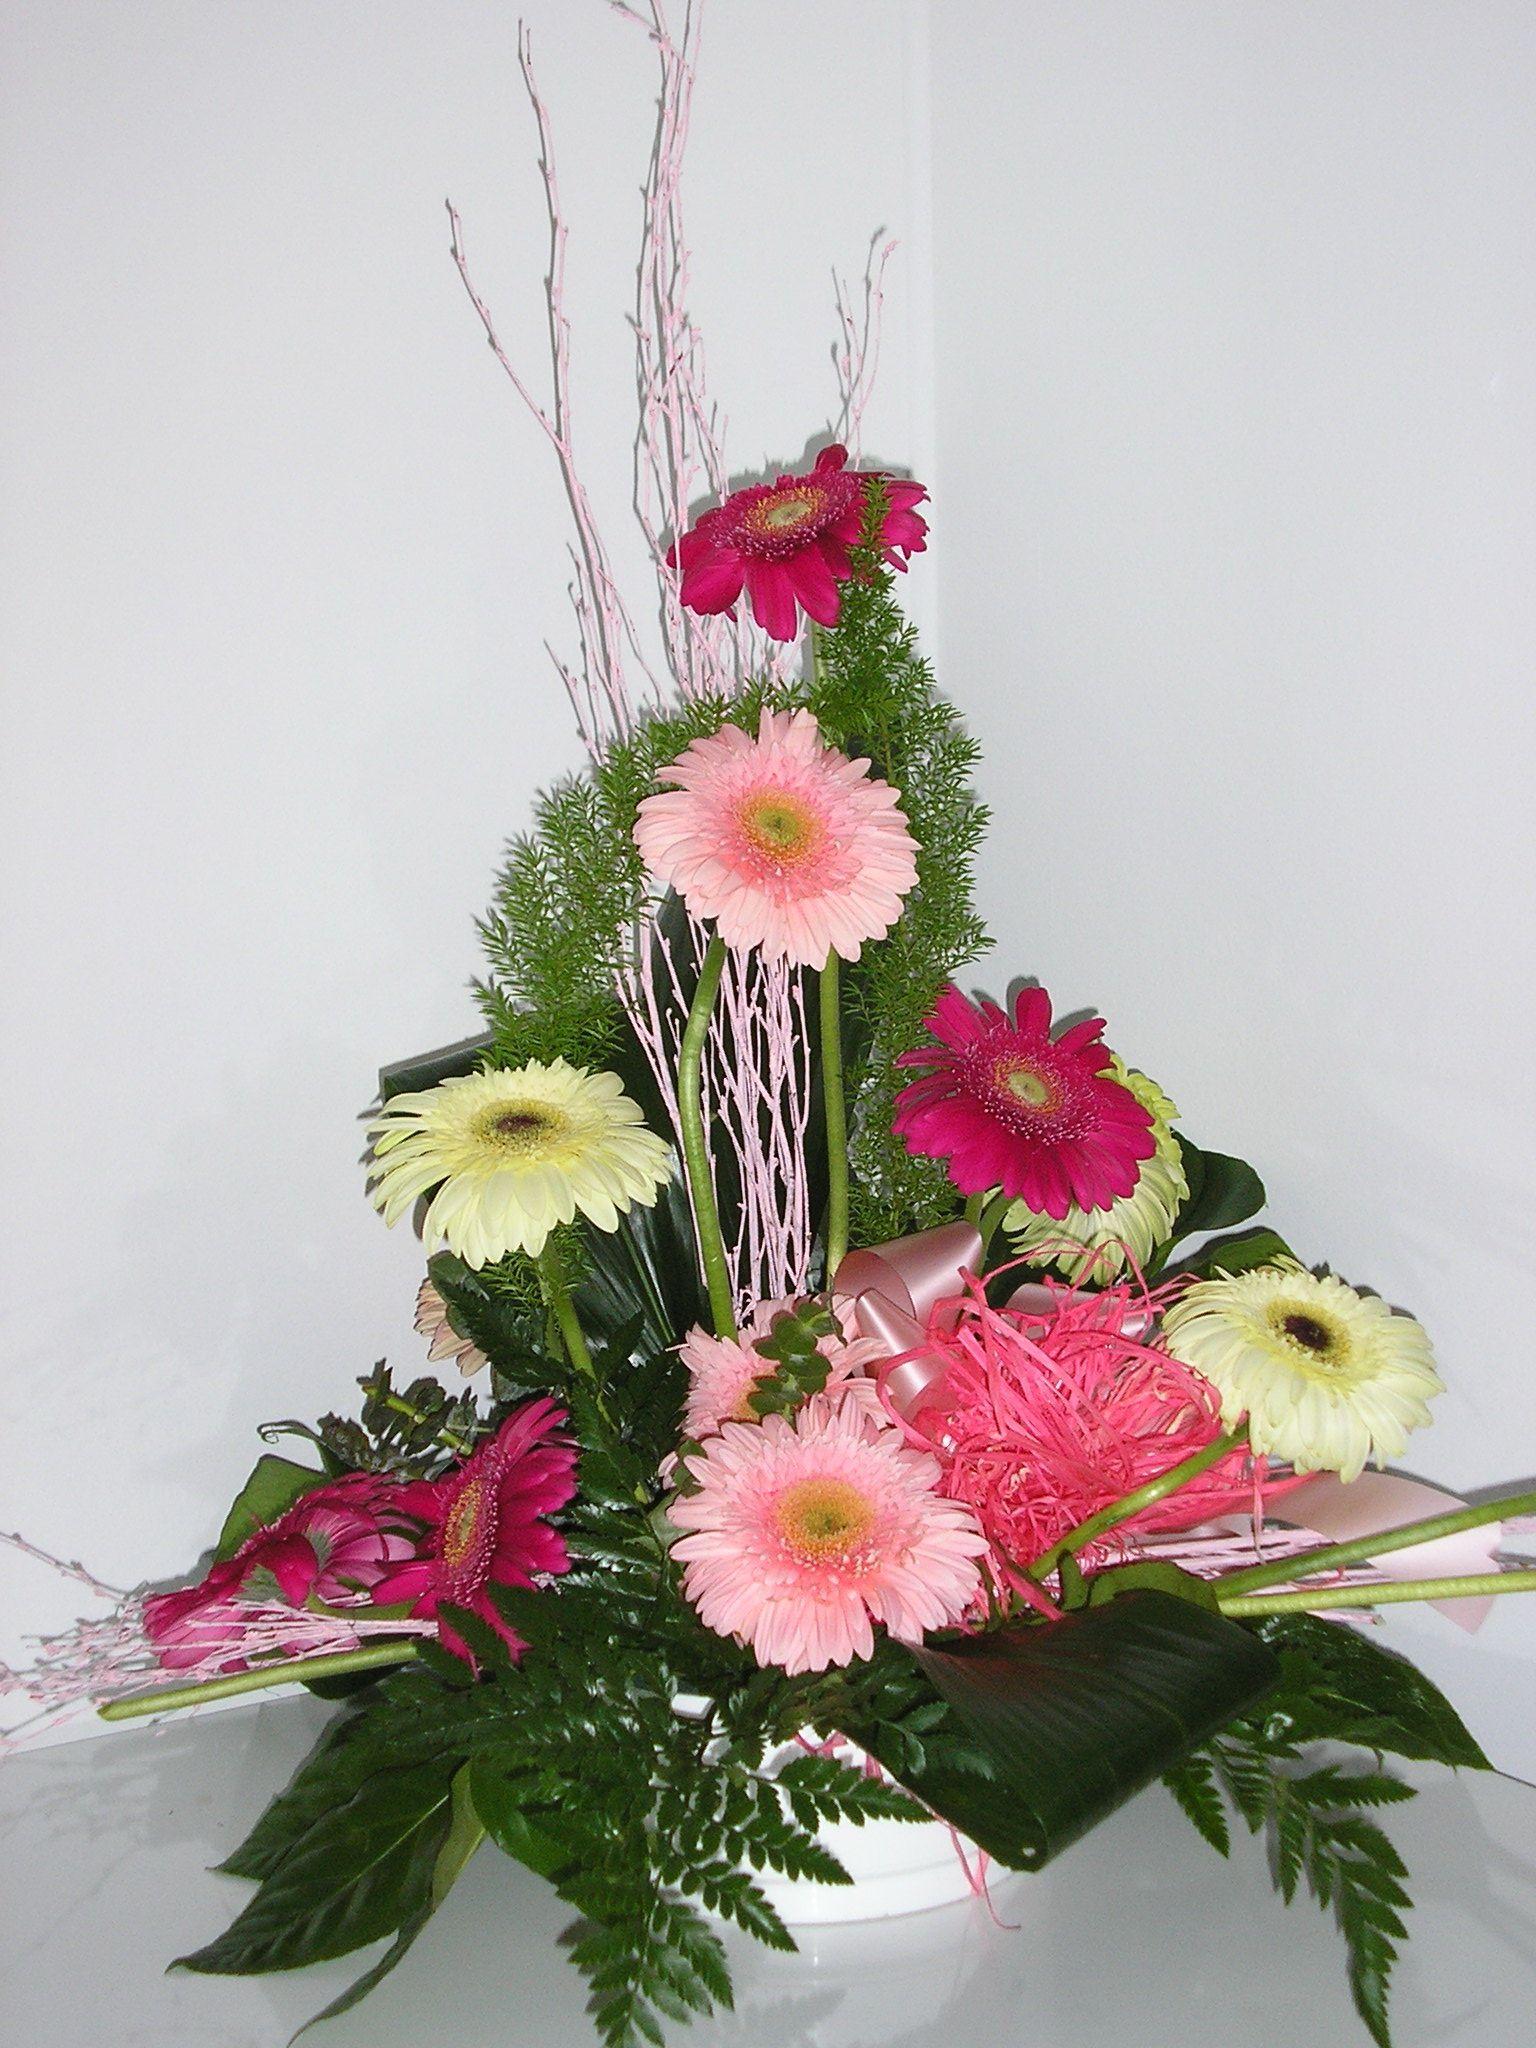 Centro De Gerberas Para Nacimiento Http Www Milejardin Com Floristeria Nacimientos Bebe Beautiful Flowers Flower Arrangements Beautiful Blooms